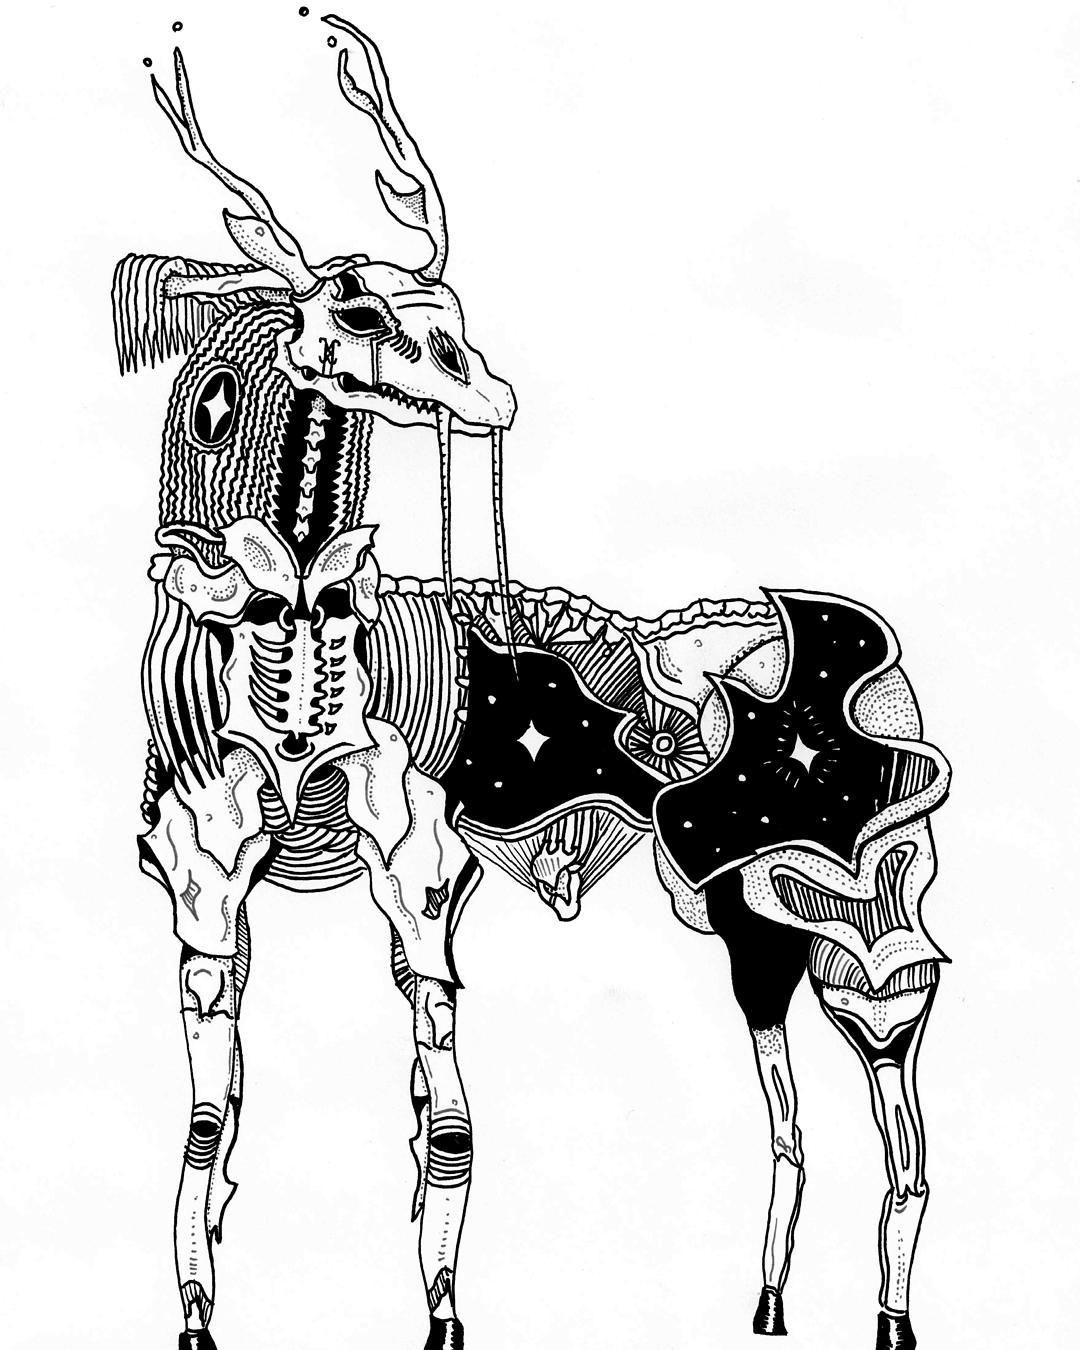 Spirit Antler #blackwork #blackworktattoo #antler #deer #spirit #occult #stars #walross #skull #art #design #illustration #munich #beast #cosmic #hexvessel #beingasanocean #hunterswillbehunted #wildlife #forestlife #atmosphericblackmetal #blackmetal